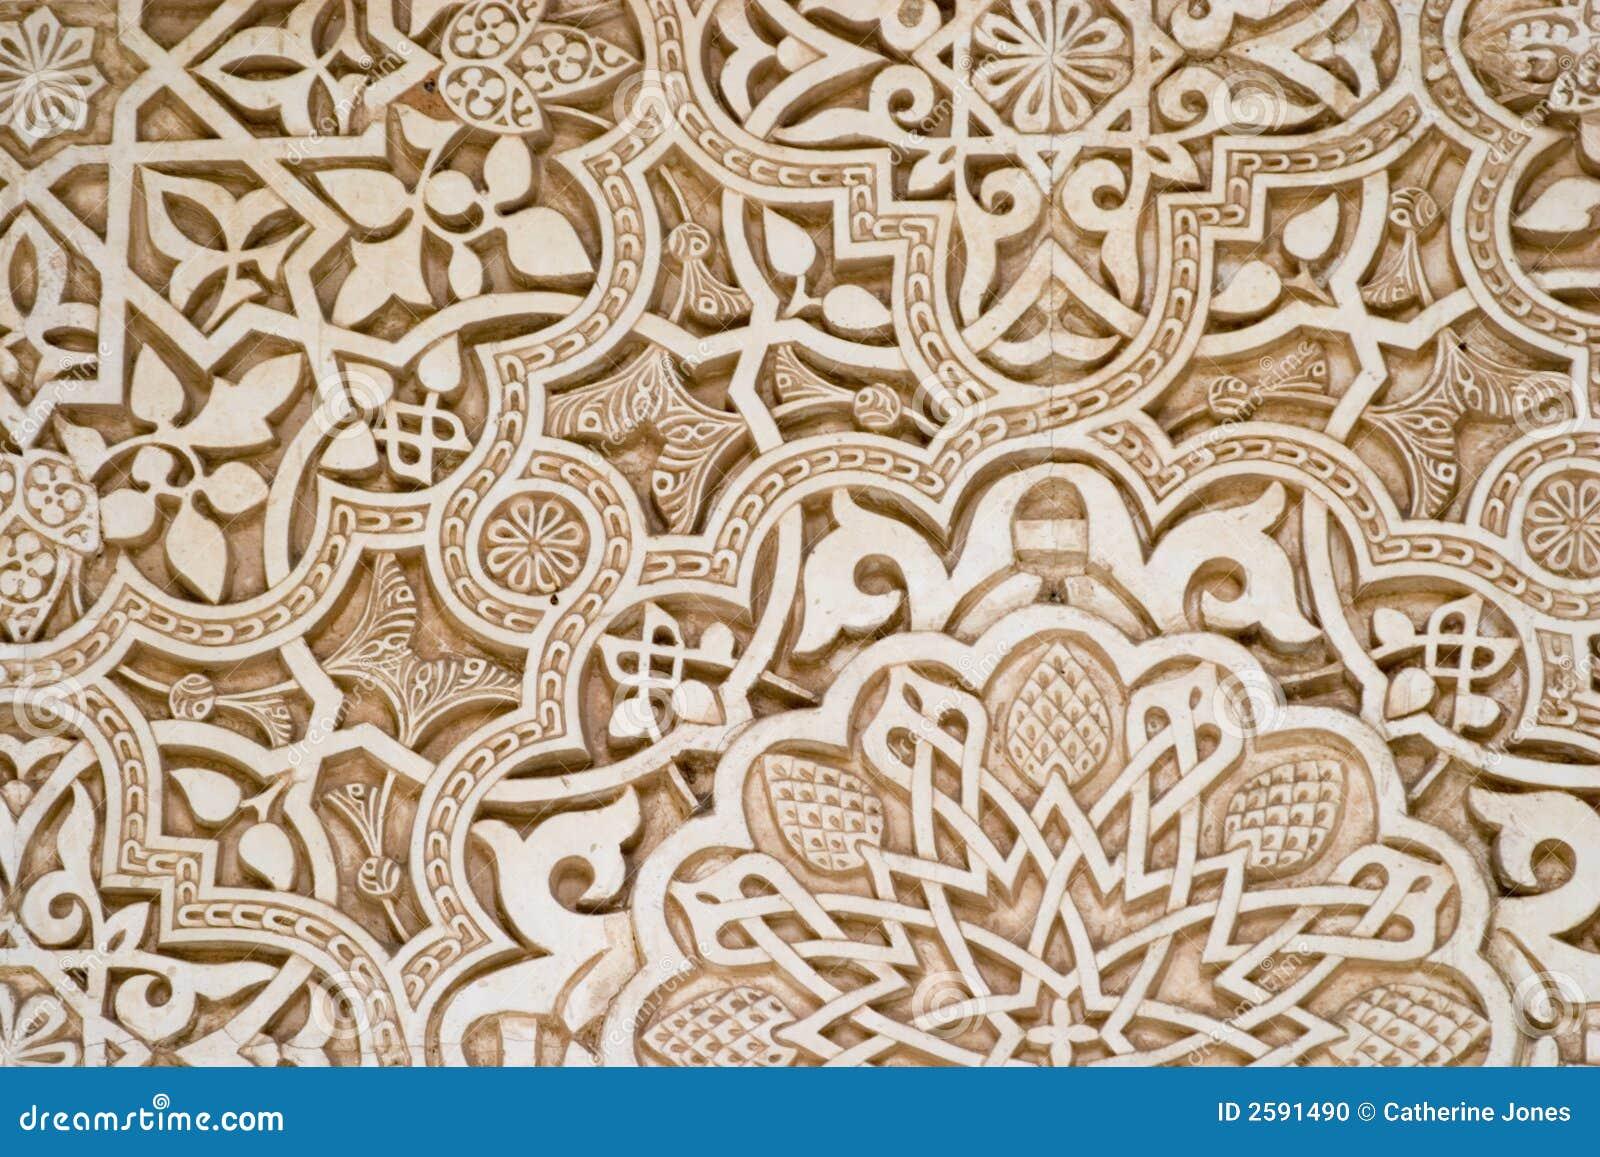 Arte islâmica - Alhambra